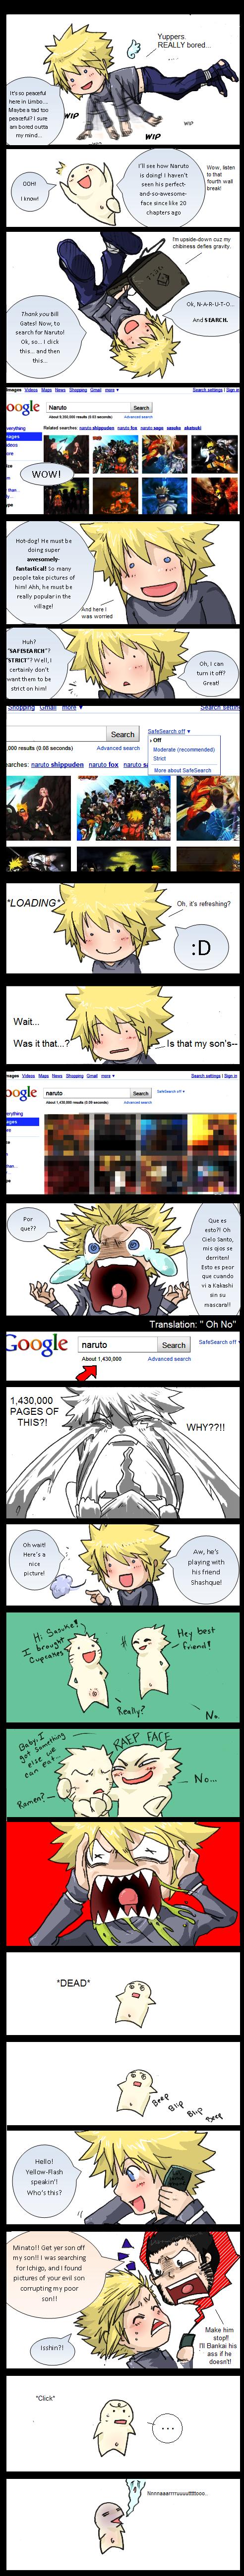 'Make us laugh' Game Naruto__overload_by_teh_akuma_yoru-d2xyw04